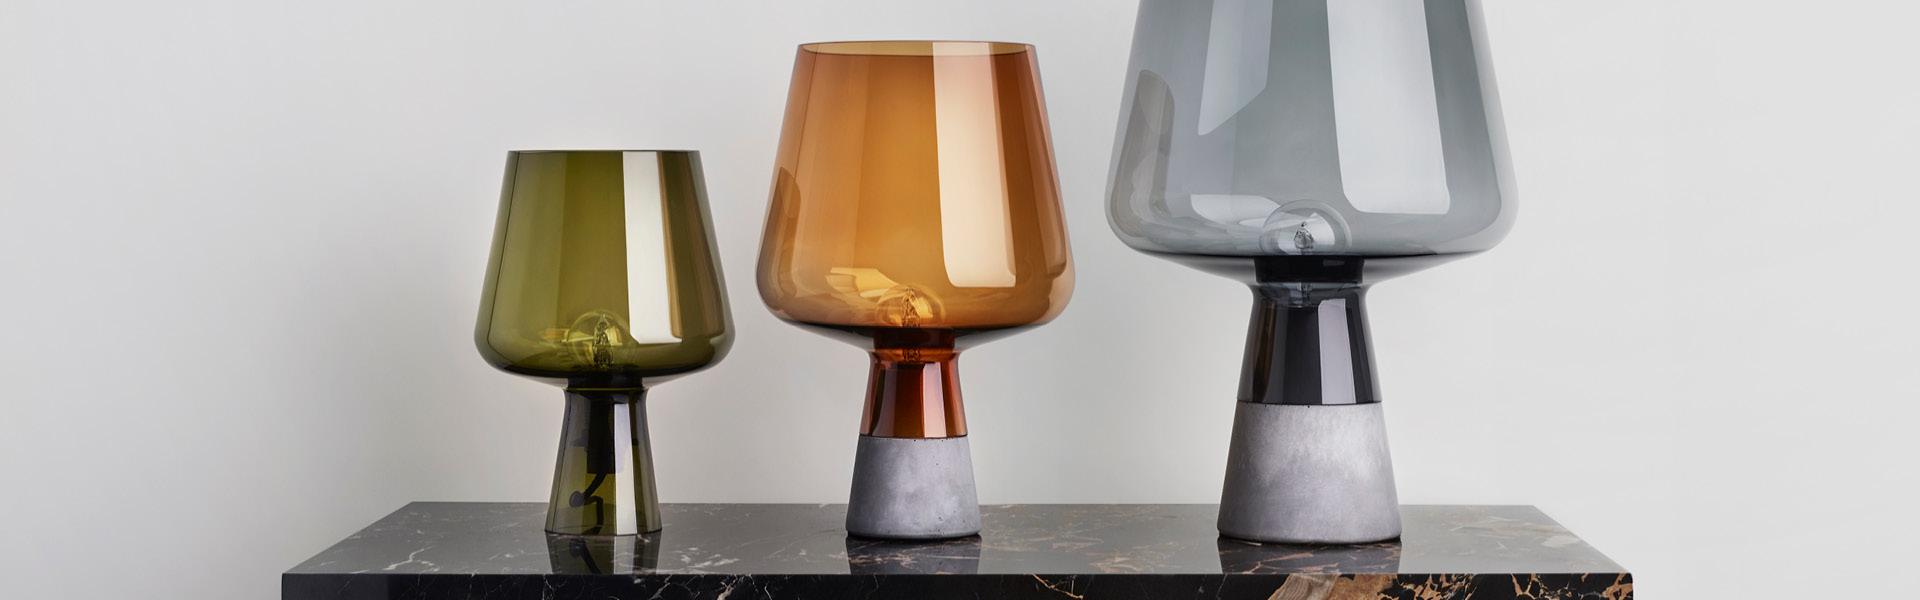 Belysning-lamper-bordlampe-Iittala-Leimu.jpg